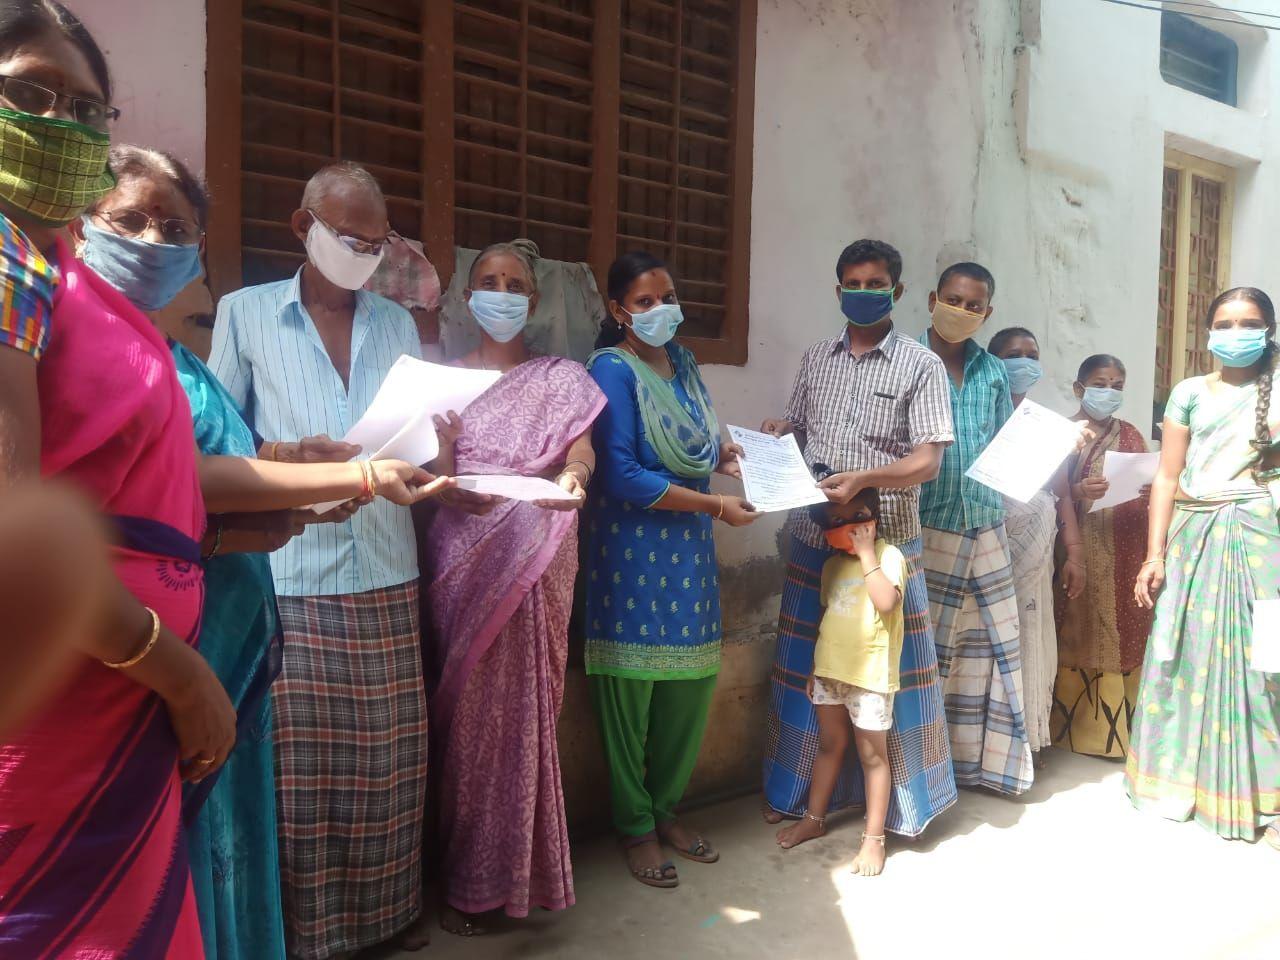 TNLA2021 - 97 Kumarapalayam - Voters Awareness Programme - Notice issued - Pallipalayam Block - On 01.04.2021